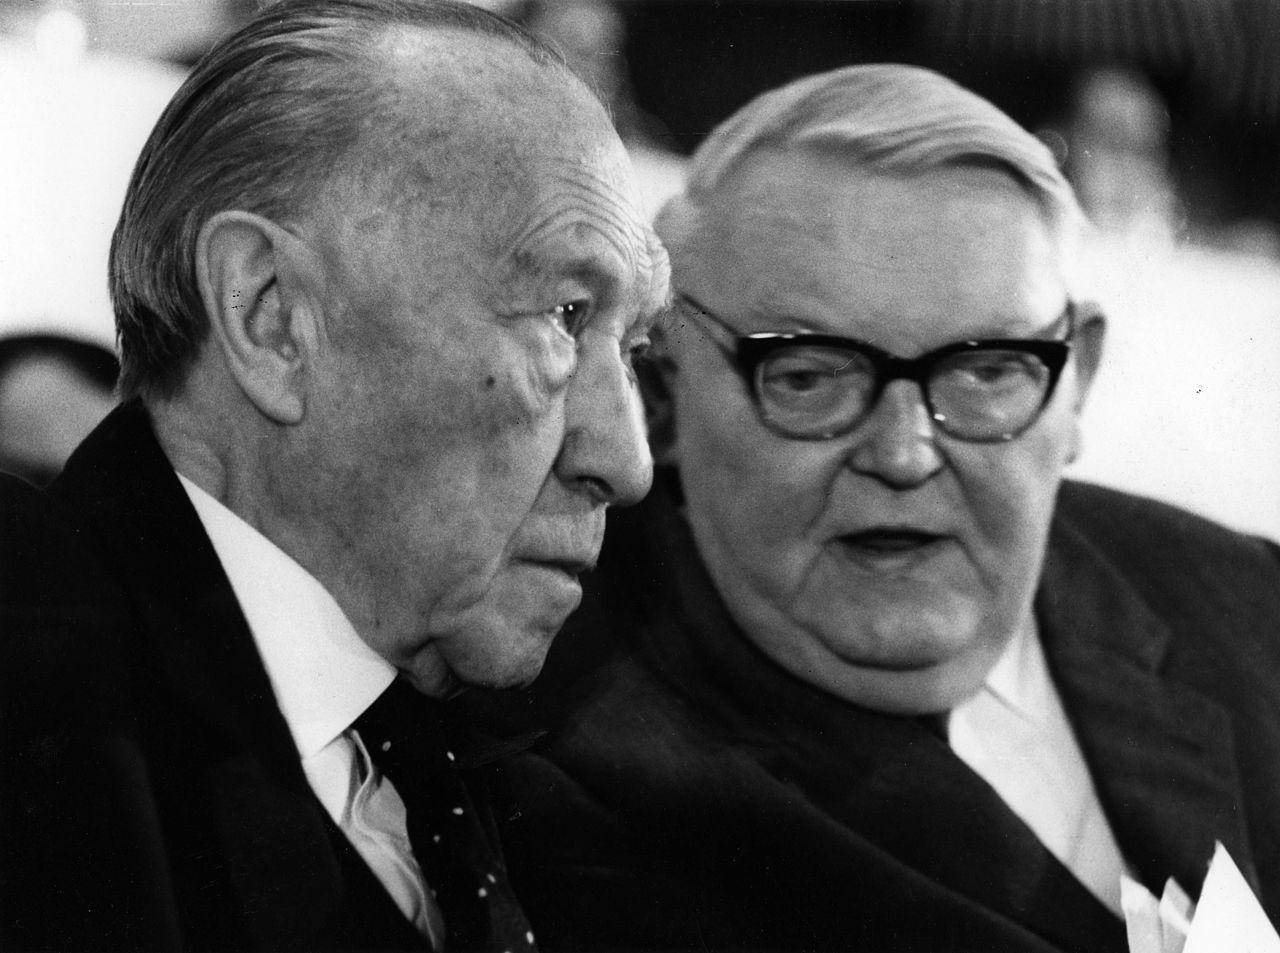 Konrad Adenauer - Im Gespräch mit Ludwig Erhard-kasf0104.JPG